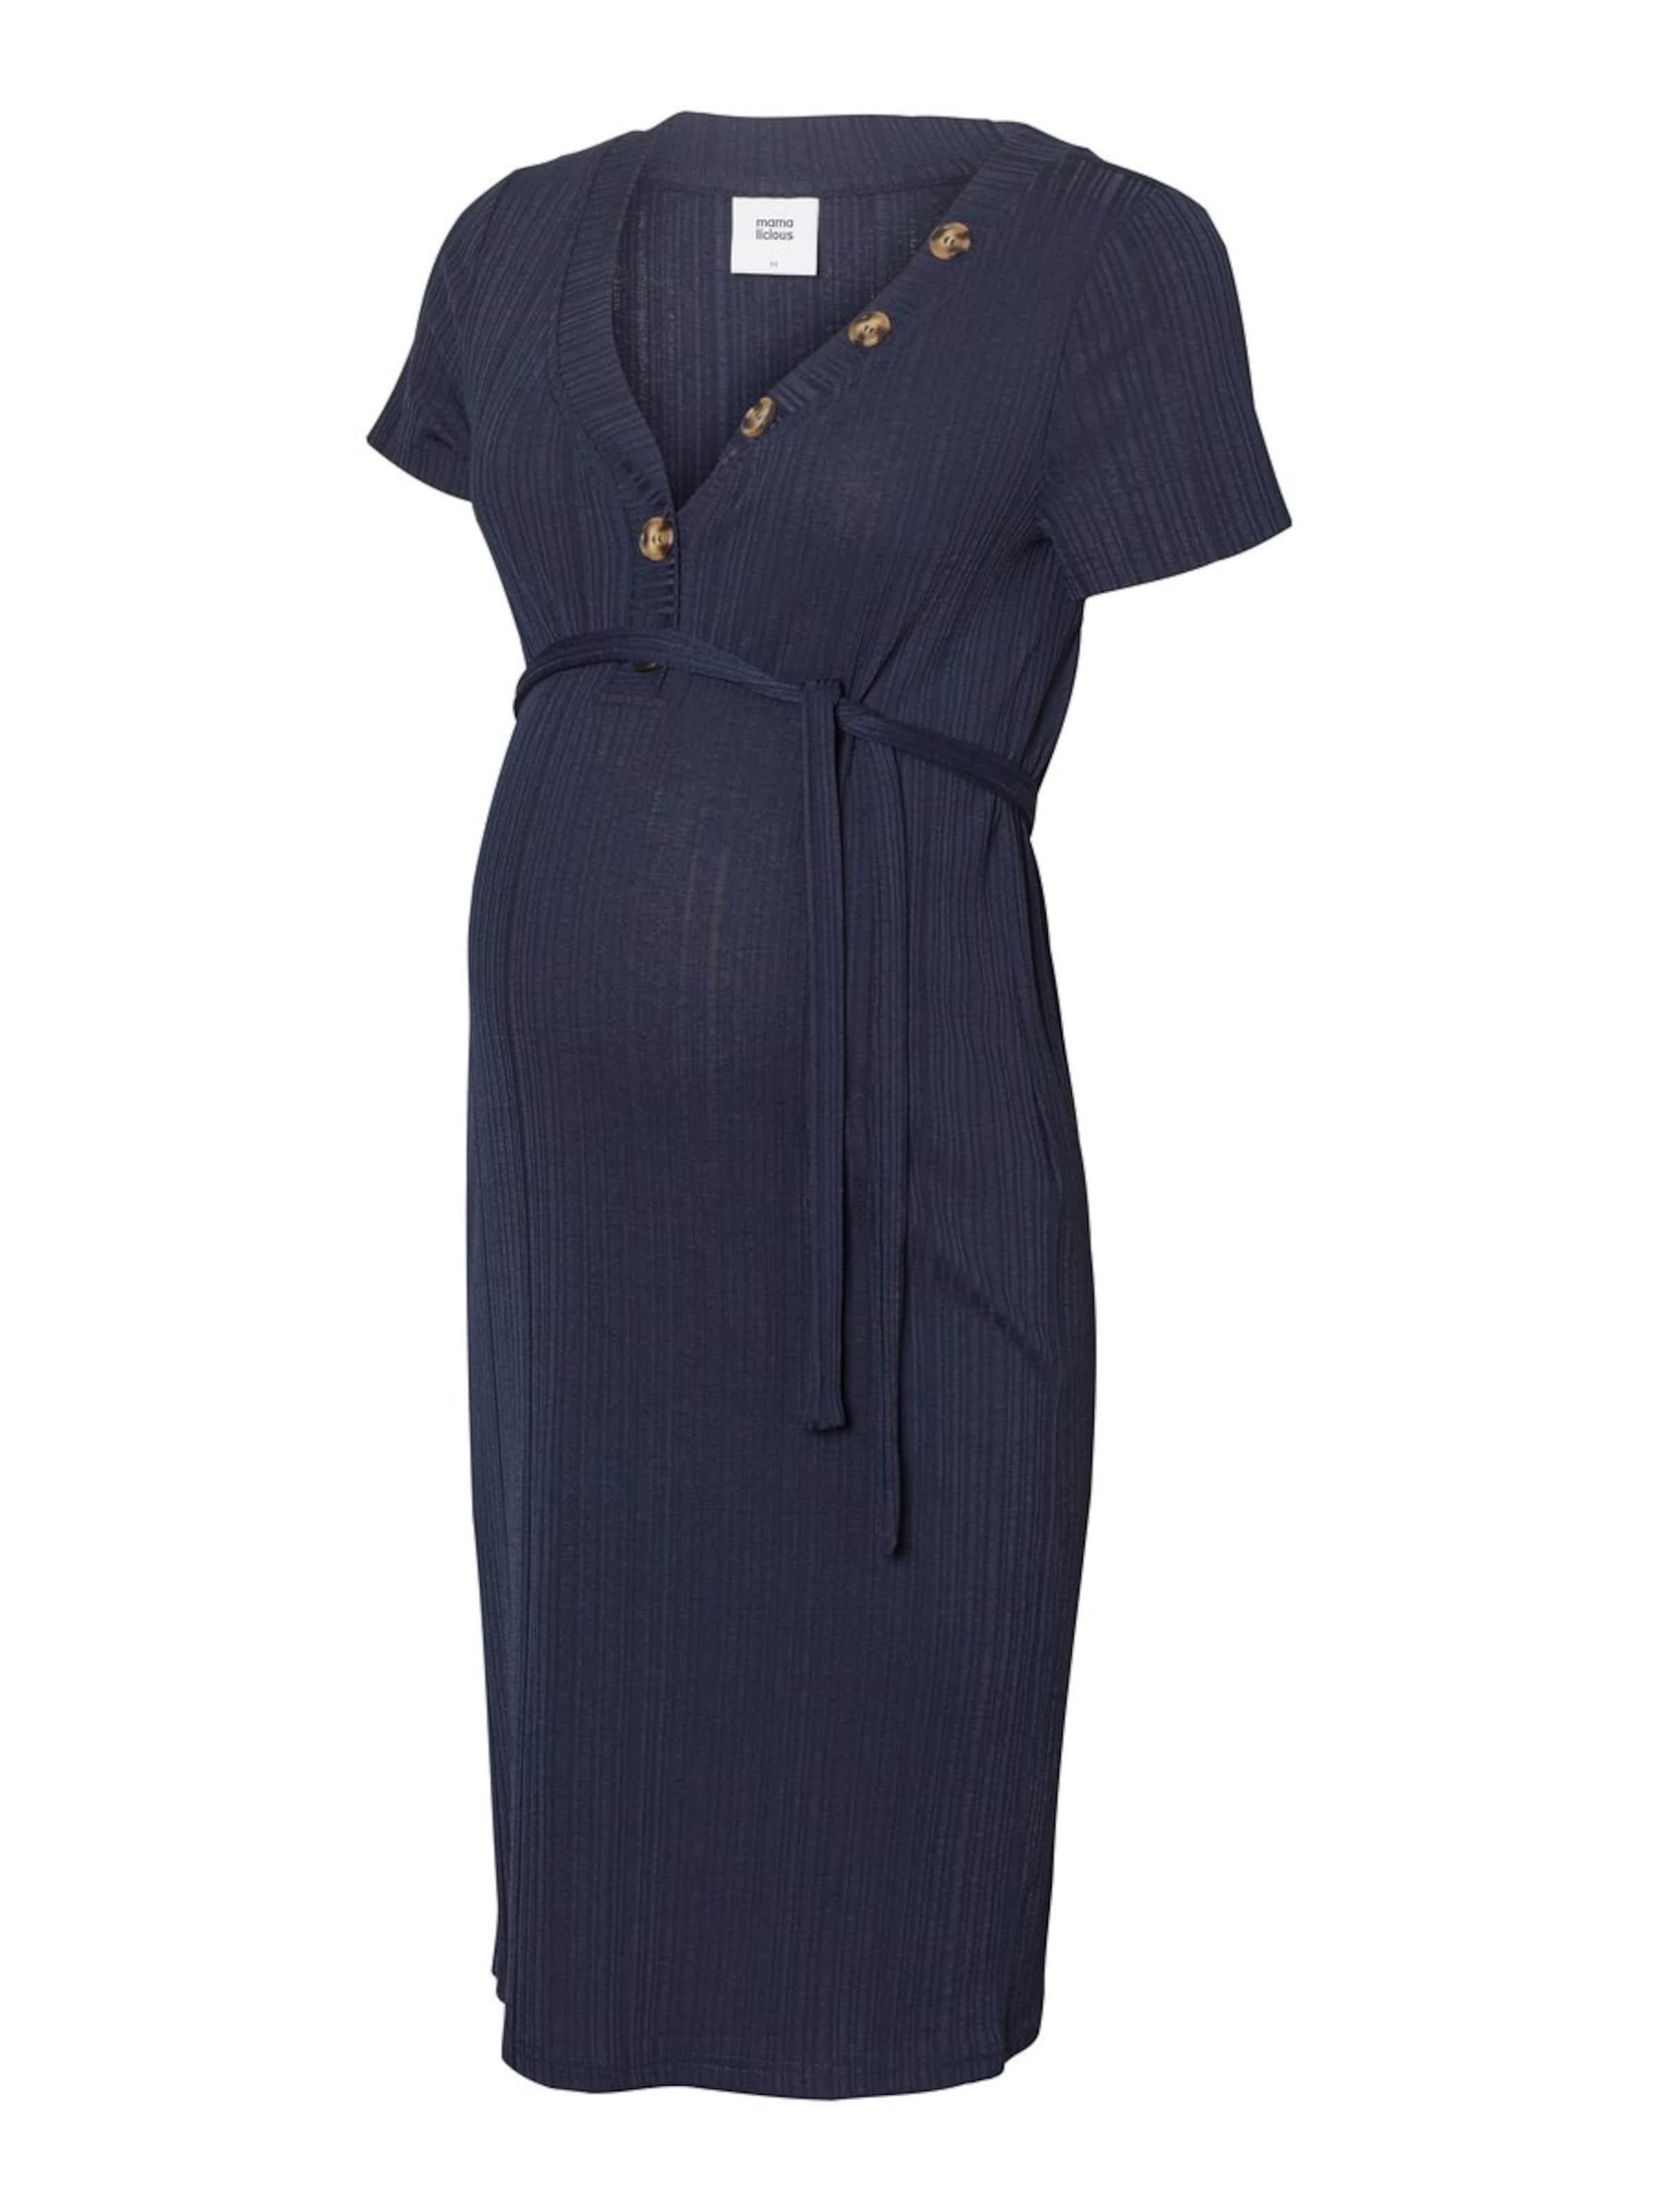 En Mamalicious Mamalicious Bleu Marine En Marine Robe Bleu Robe 76ybfYg